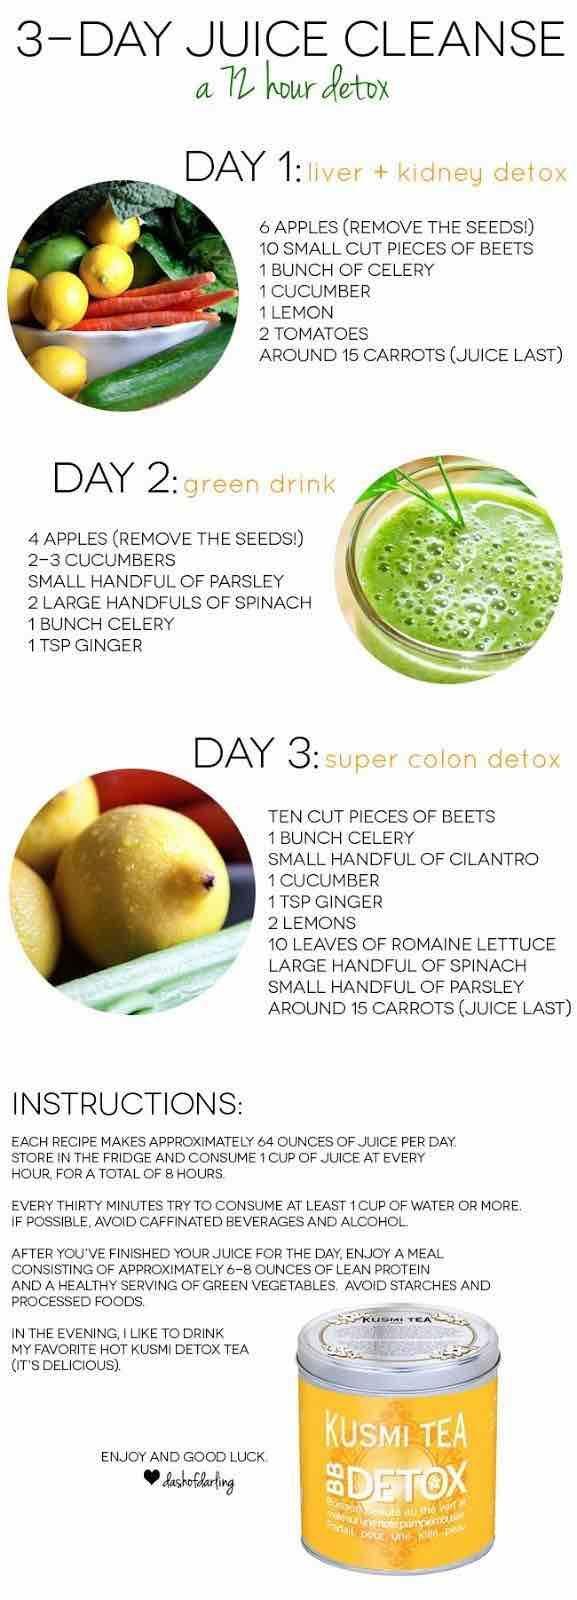 25+ best Juice Cleanse Plan ideas on Pinterest | Juice cleanse detox, Detox plan and Health cleanse